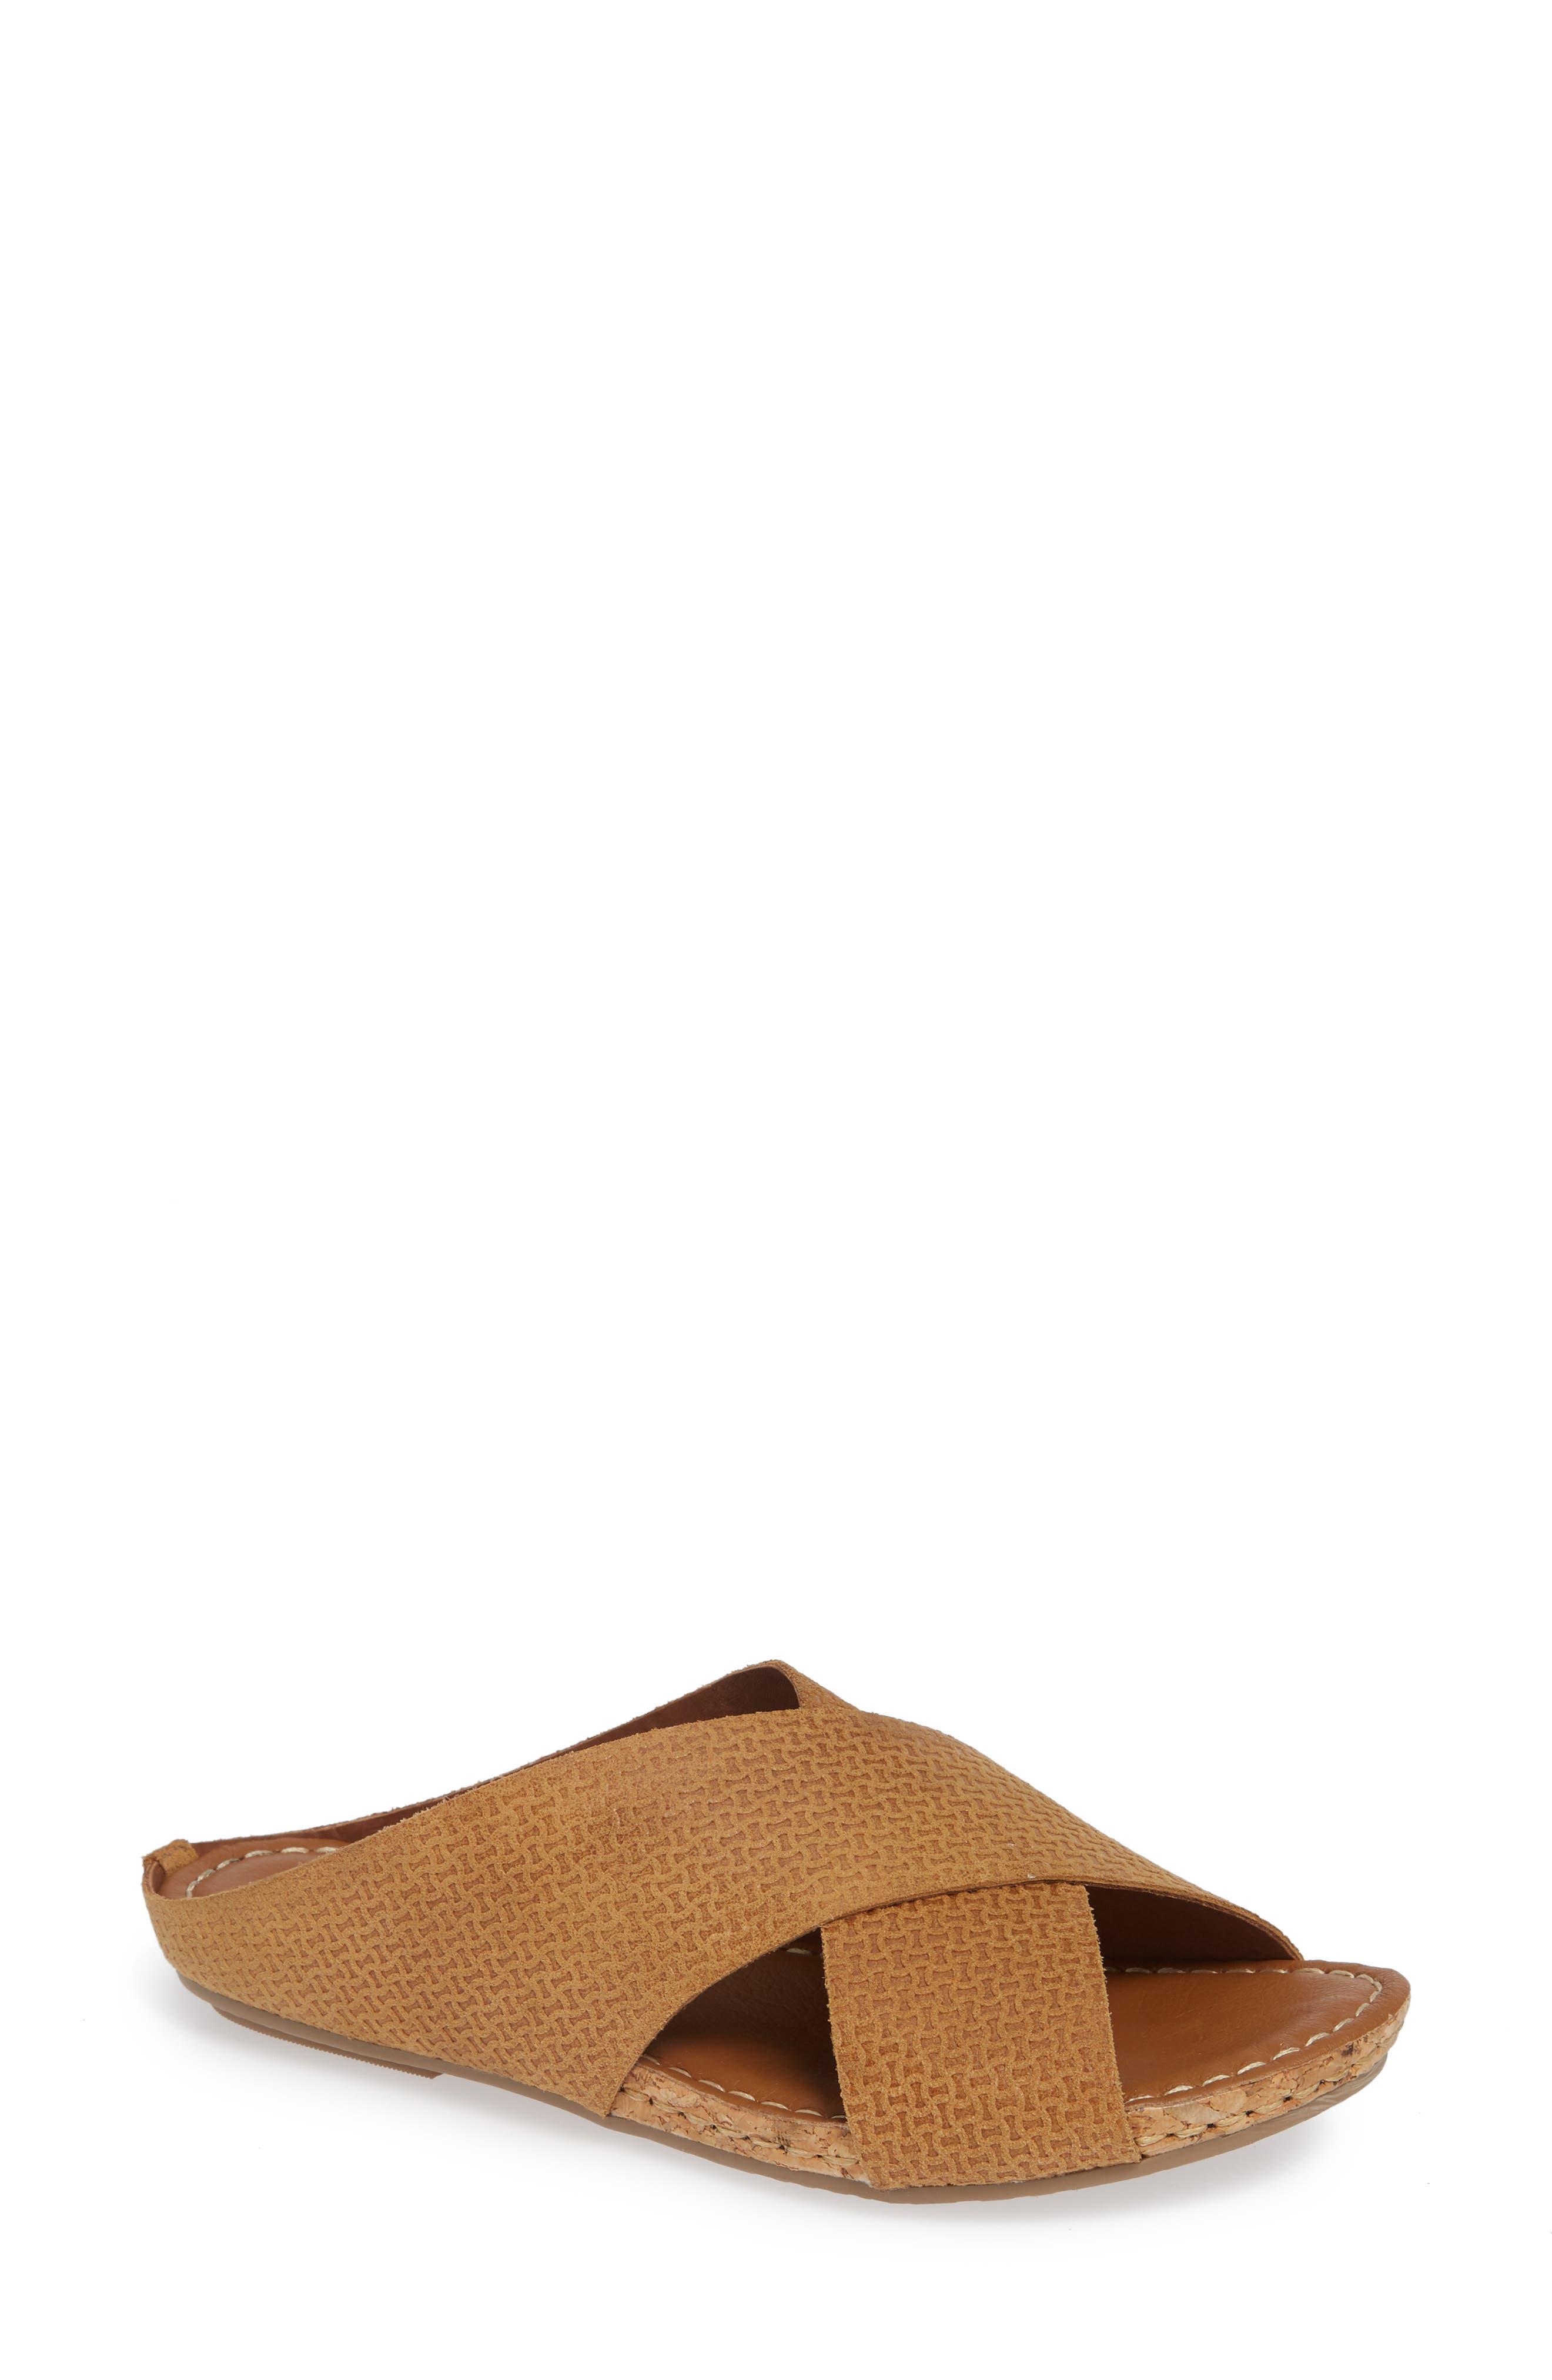 Klub Nico Gricia Slide Sandal, Brown